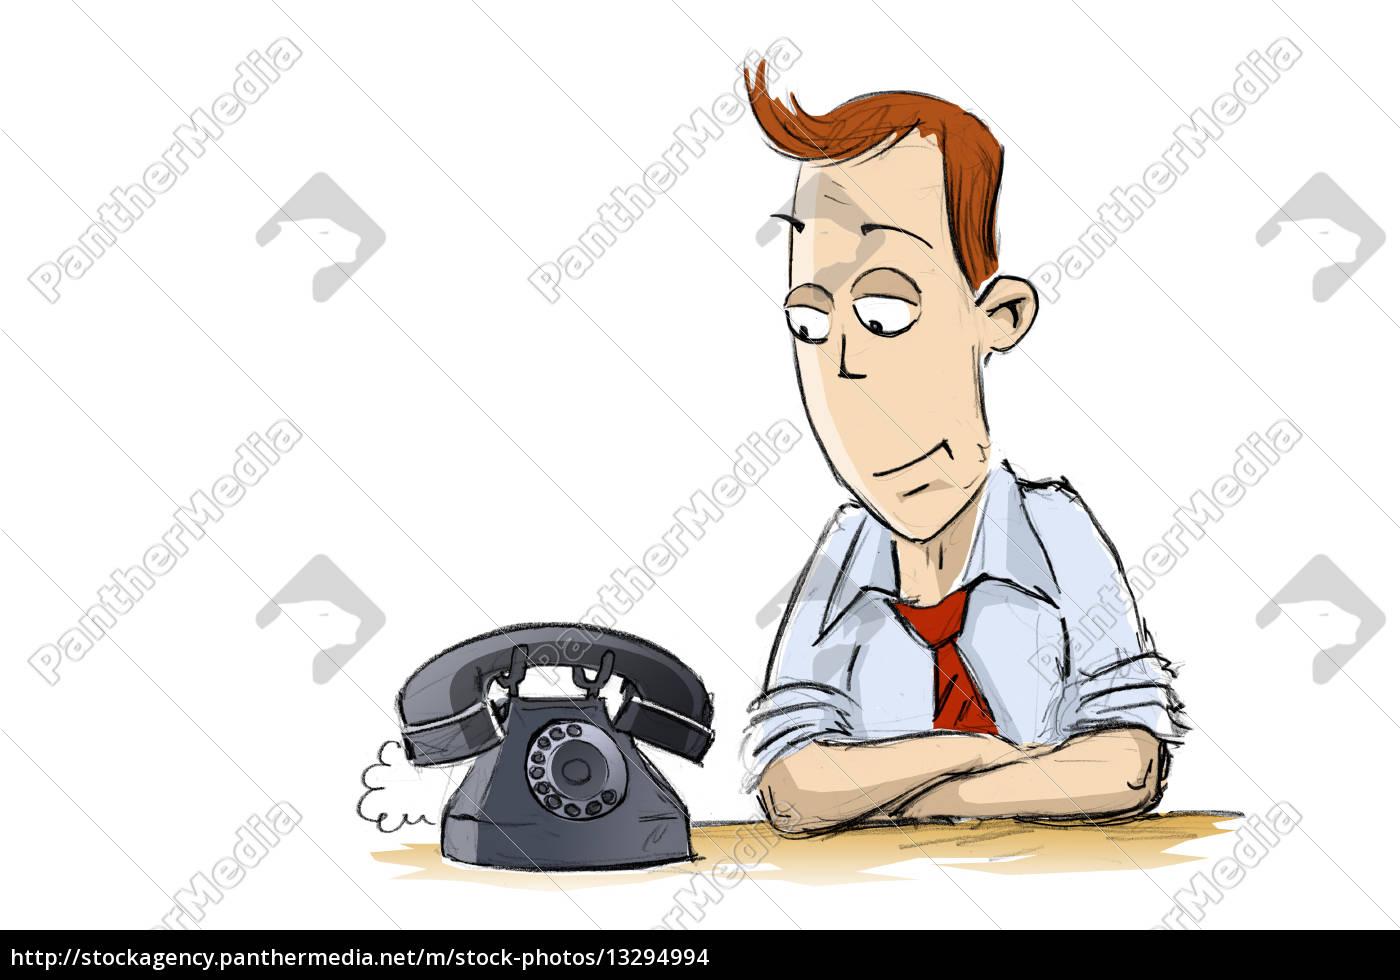 Mann Telefon Warten Anruf Comic Krawatte Lustig Kontakt Stock